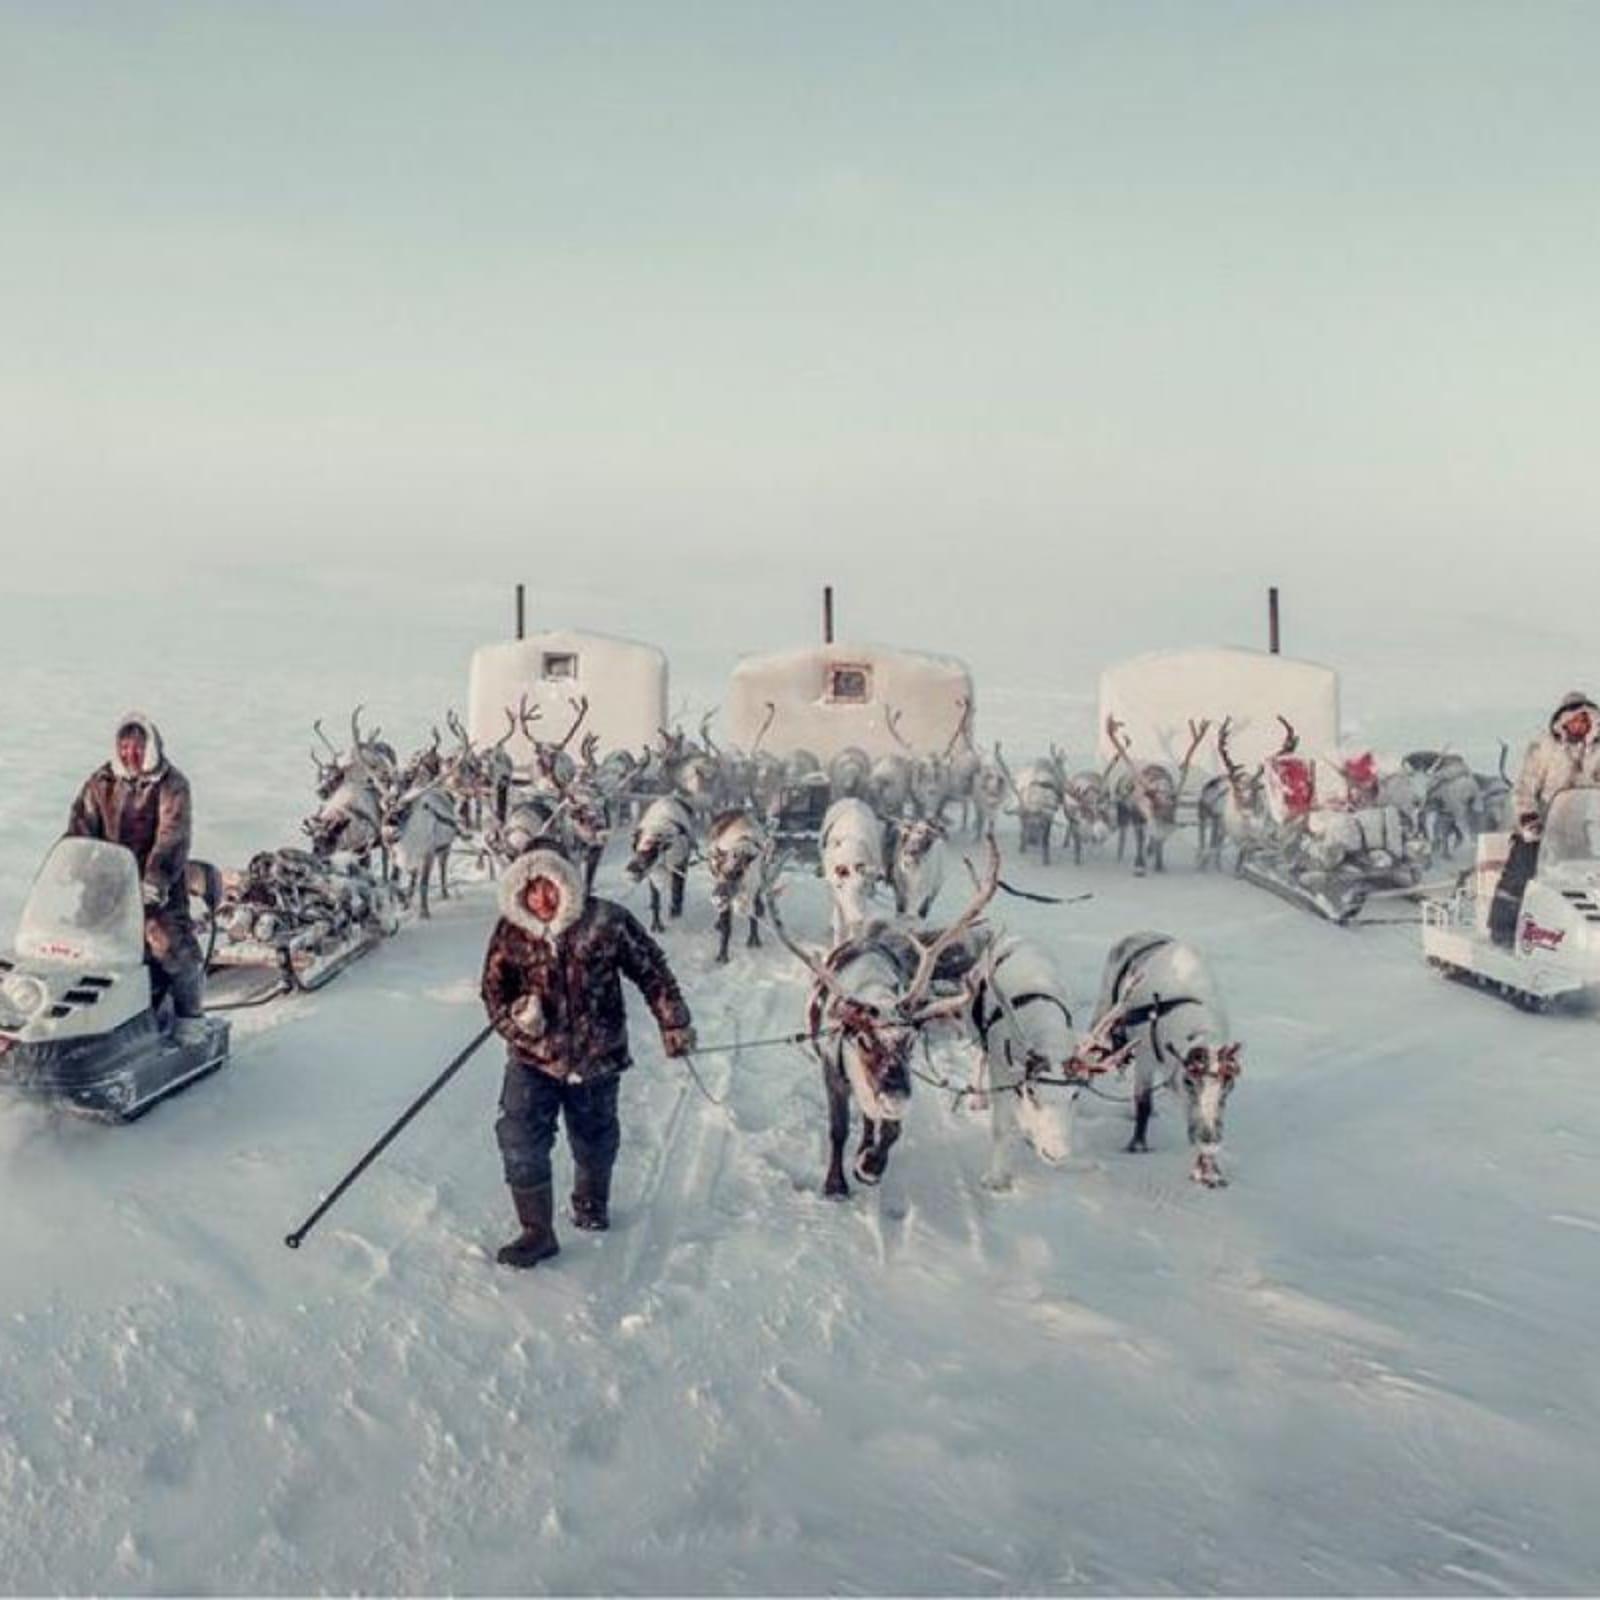 Jimmy Nelson  Dolgans, Siberia, 2018  Archival Print  Image size 80 x 160 cm  Framed size 108 x 188 cm  Edition of 6 plus 2 artist's proof